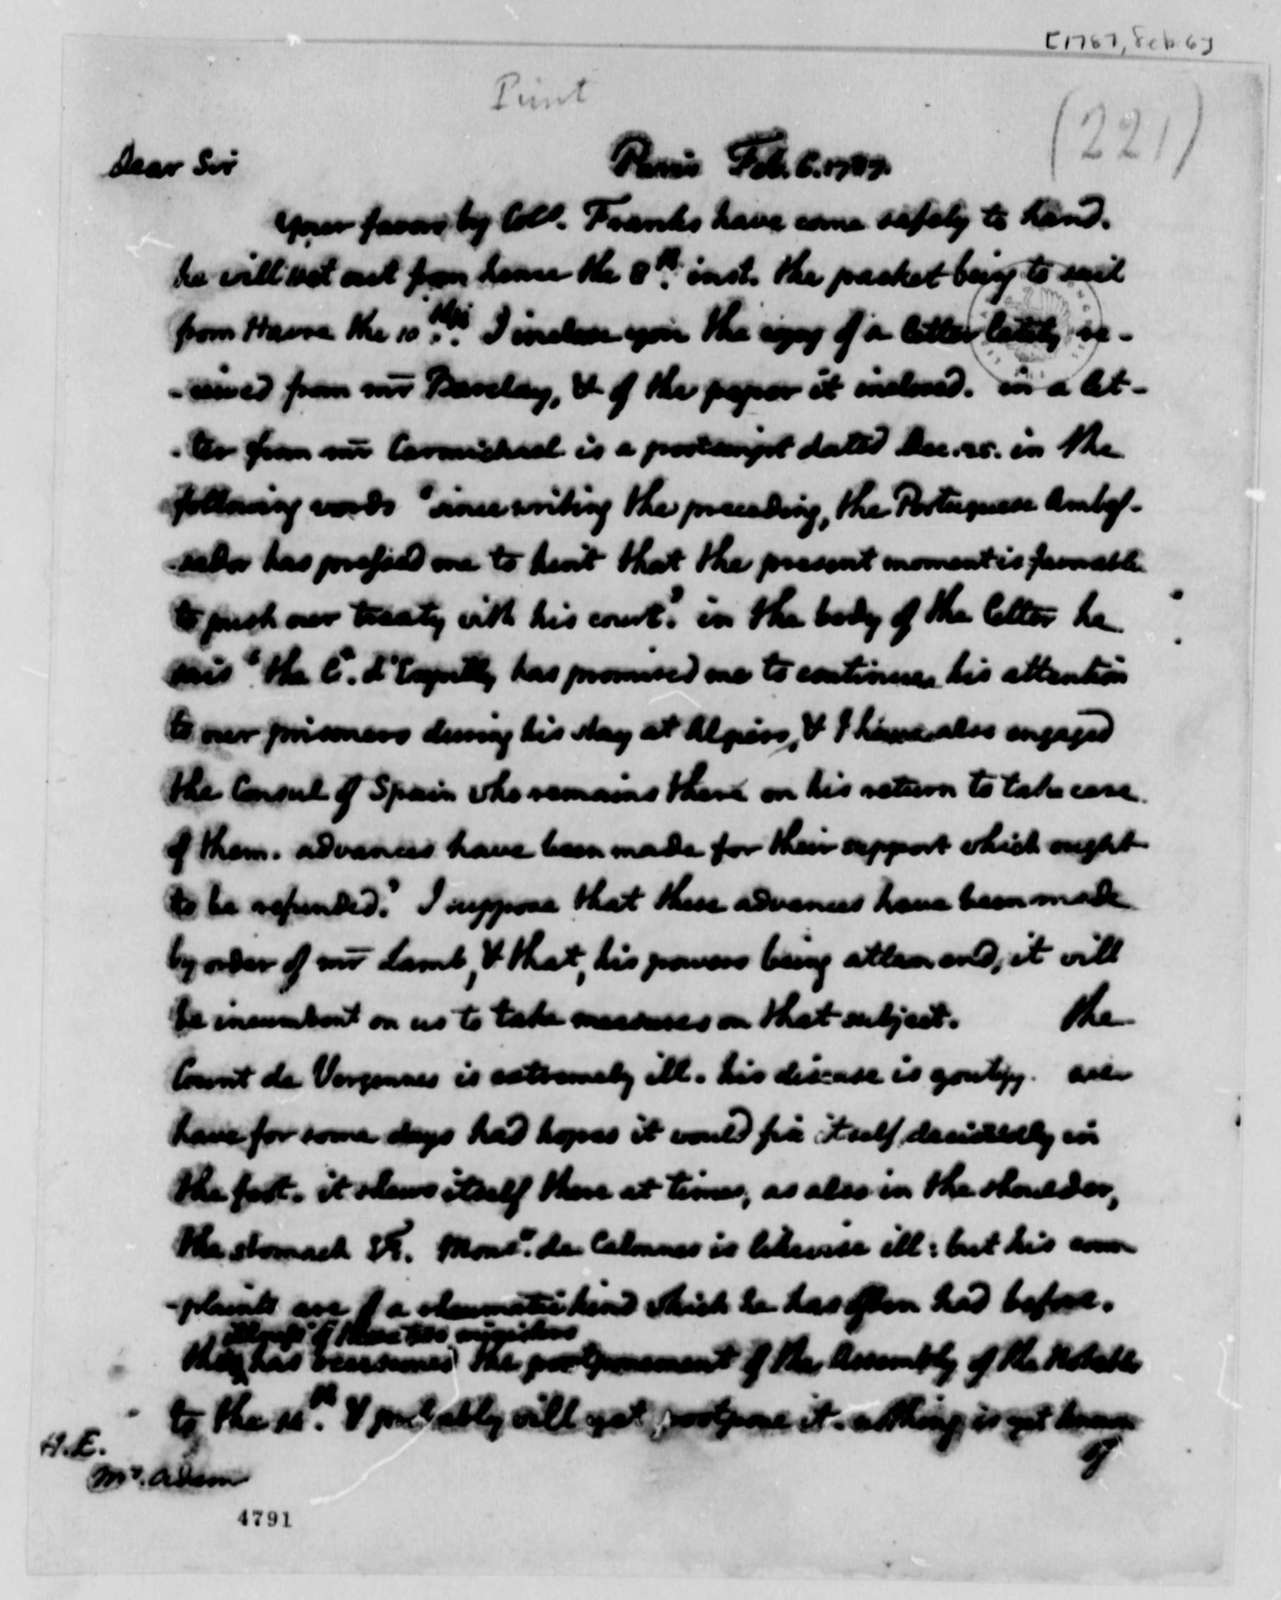 Thomas Jefferson to John Adams, February 6, 1787